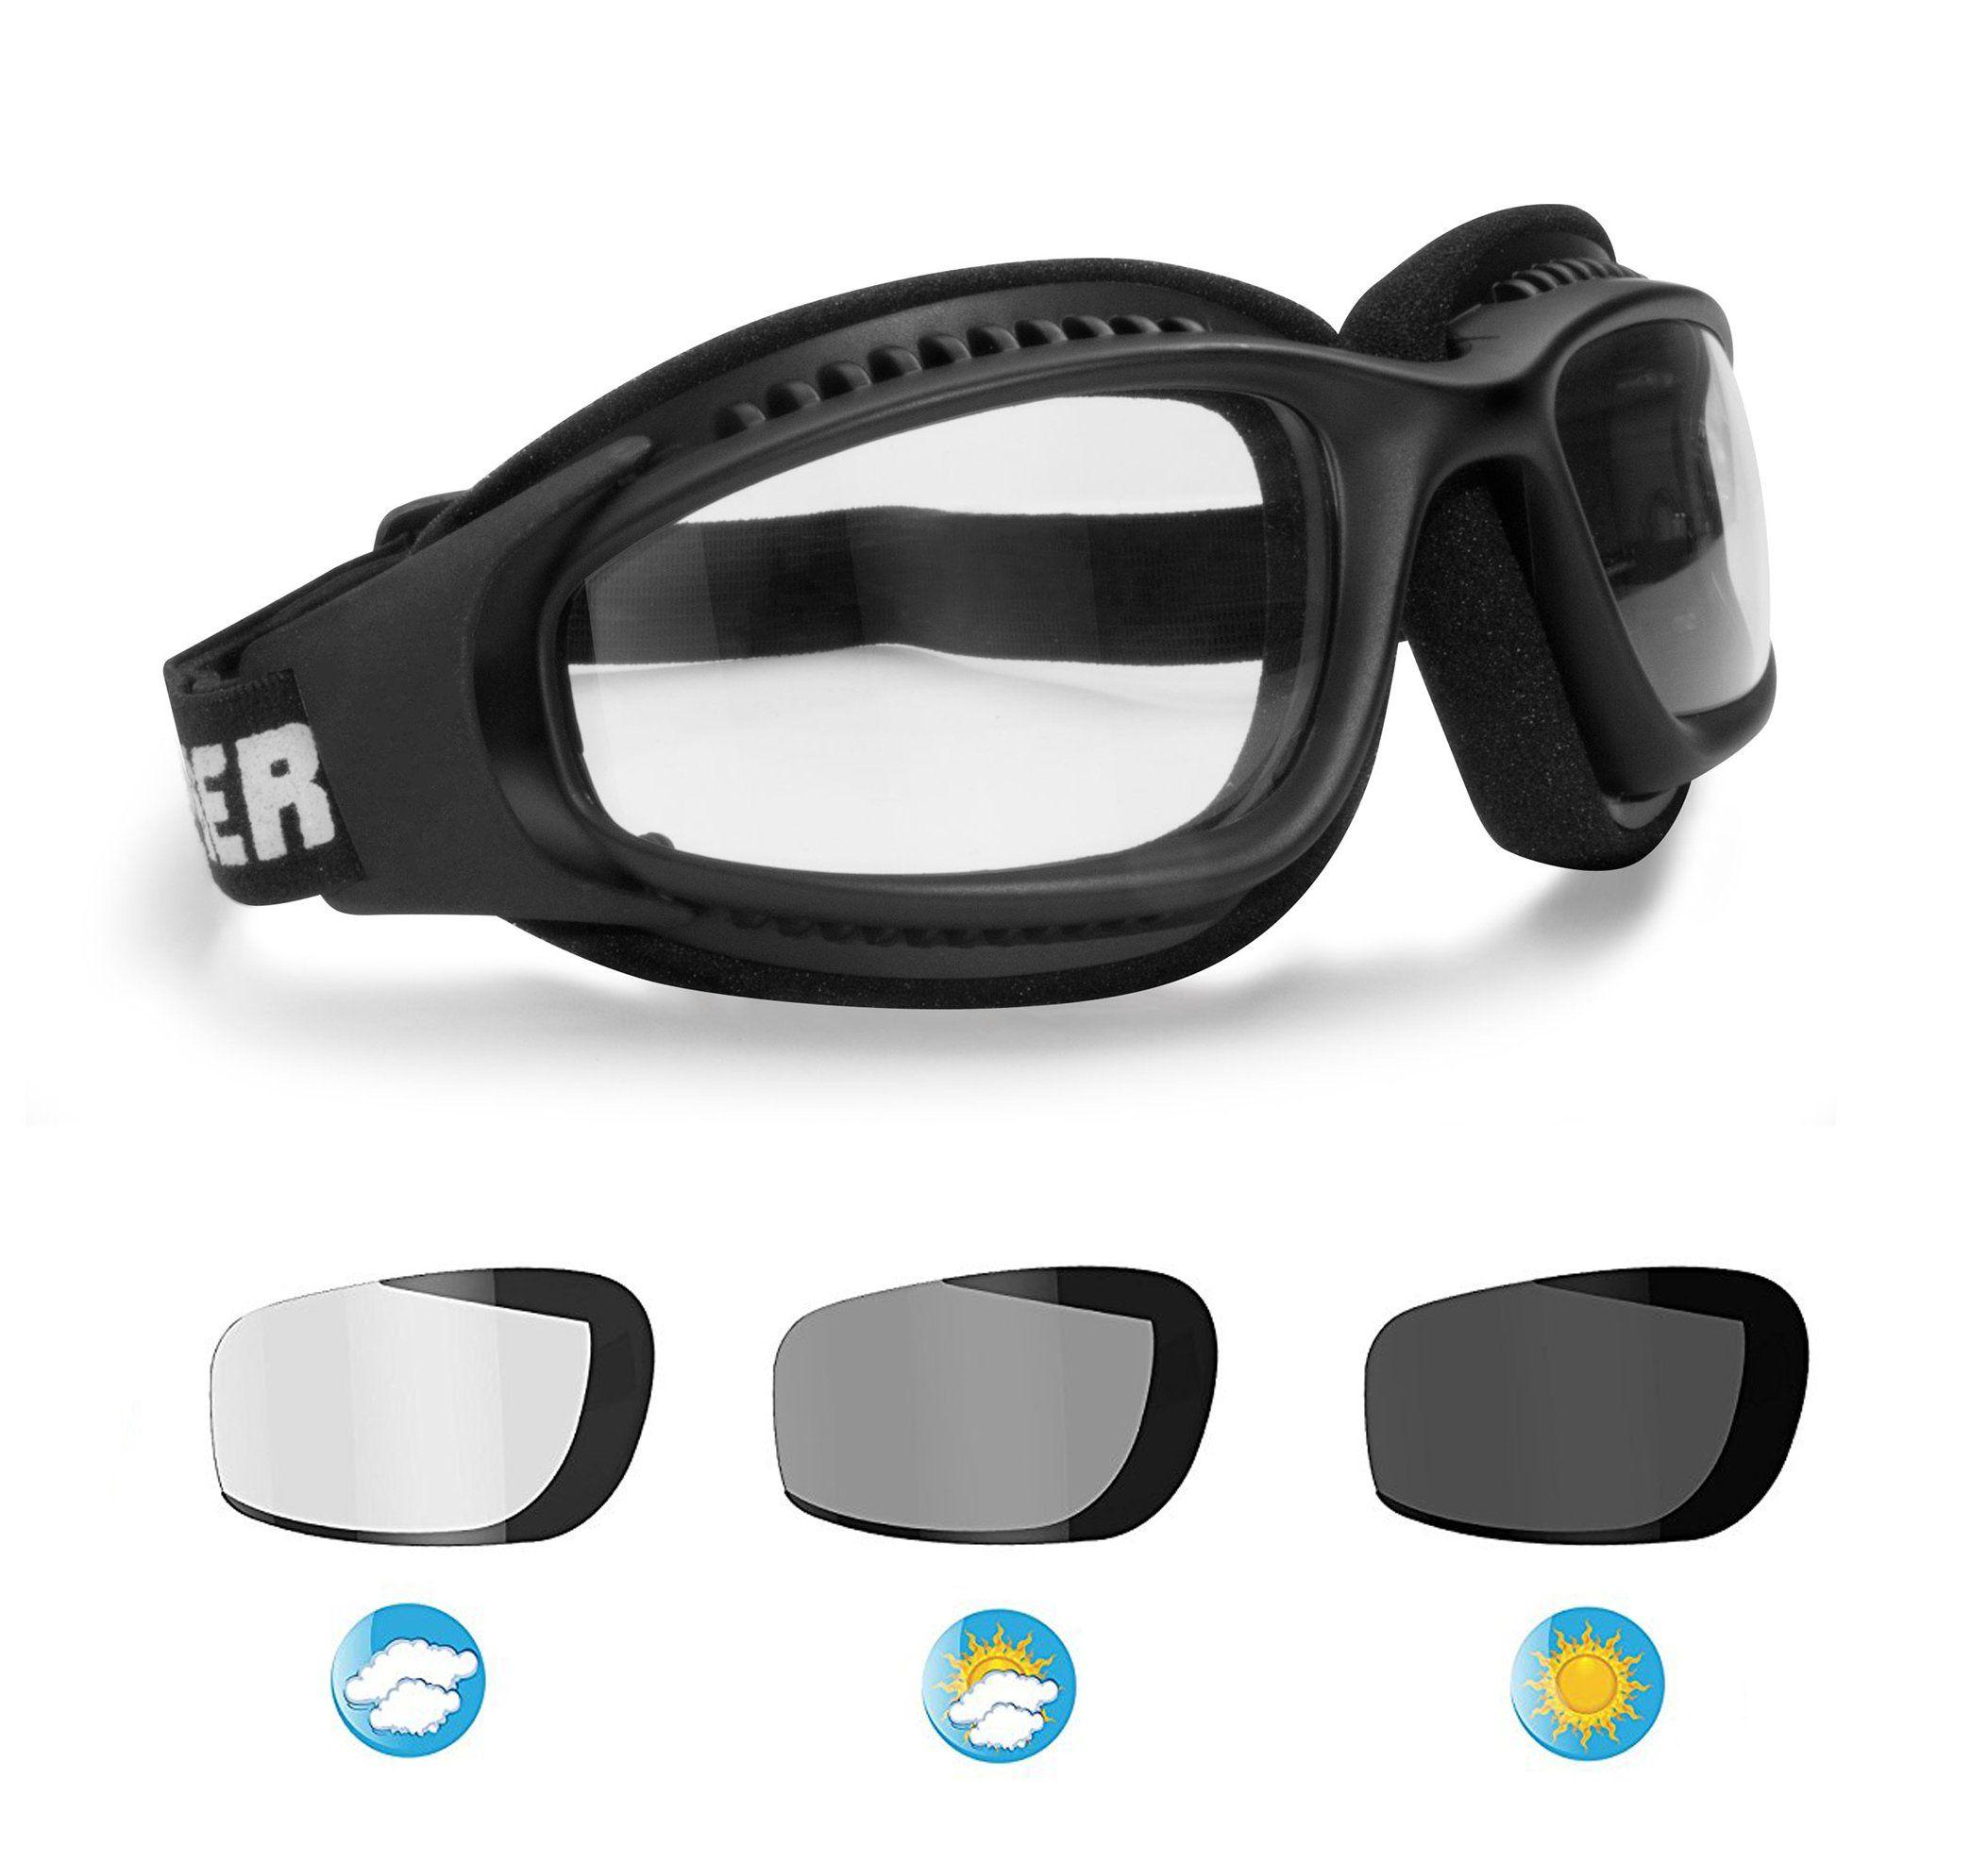 88772131ece6 Motorcycle Goggles for Helmets - Photochromic Ventilated Antifog Lens -  Adjustable Strap - Mat Black - by Bertoni Italy F113 Photochromic  Wraparound ...